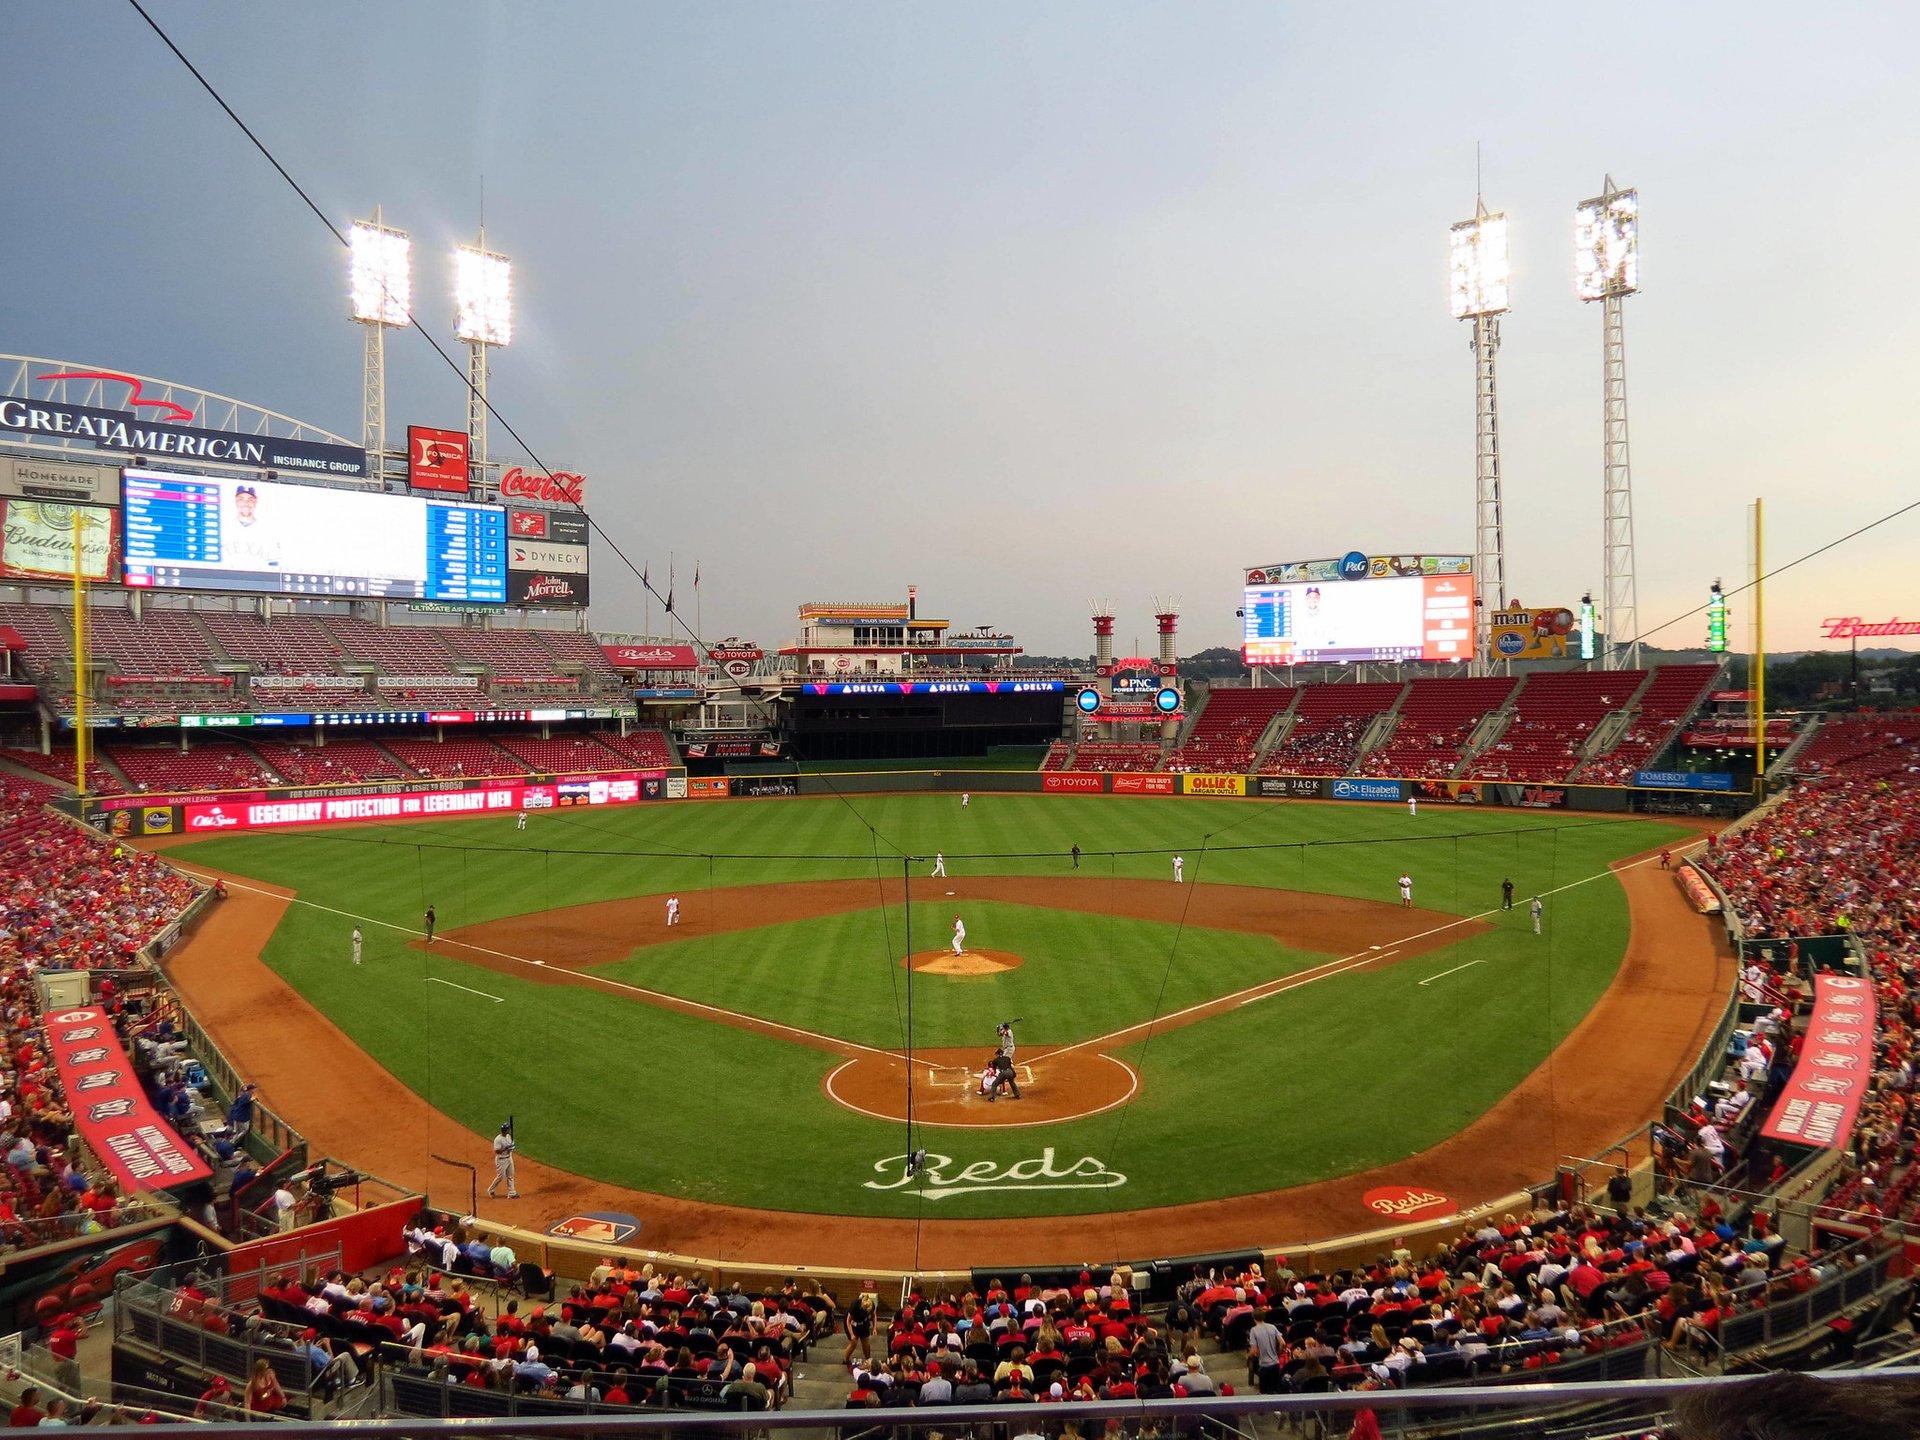 Texas Rangers @ Cincinnati Reds, Great American Ball Park  2020